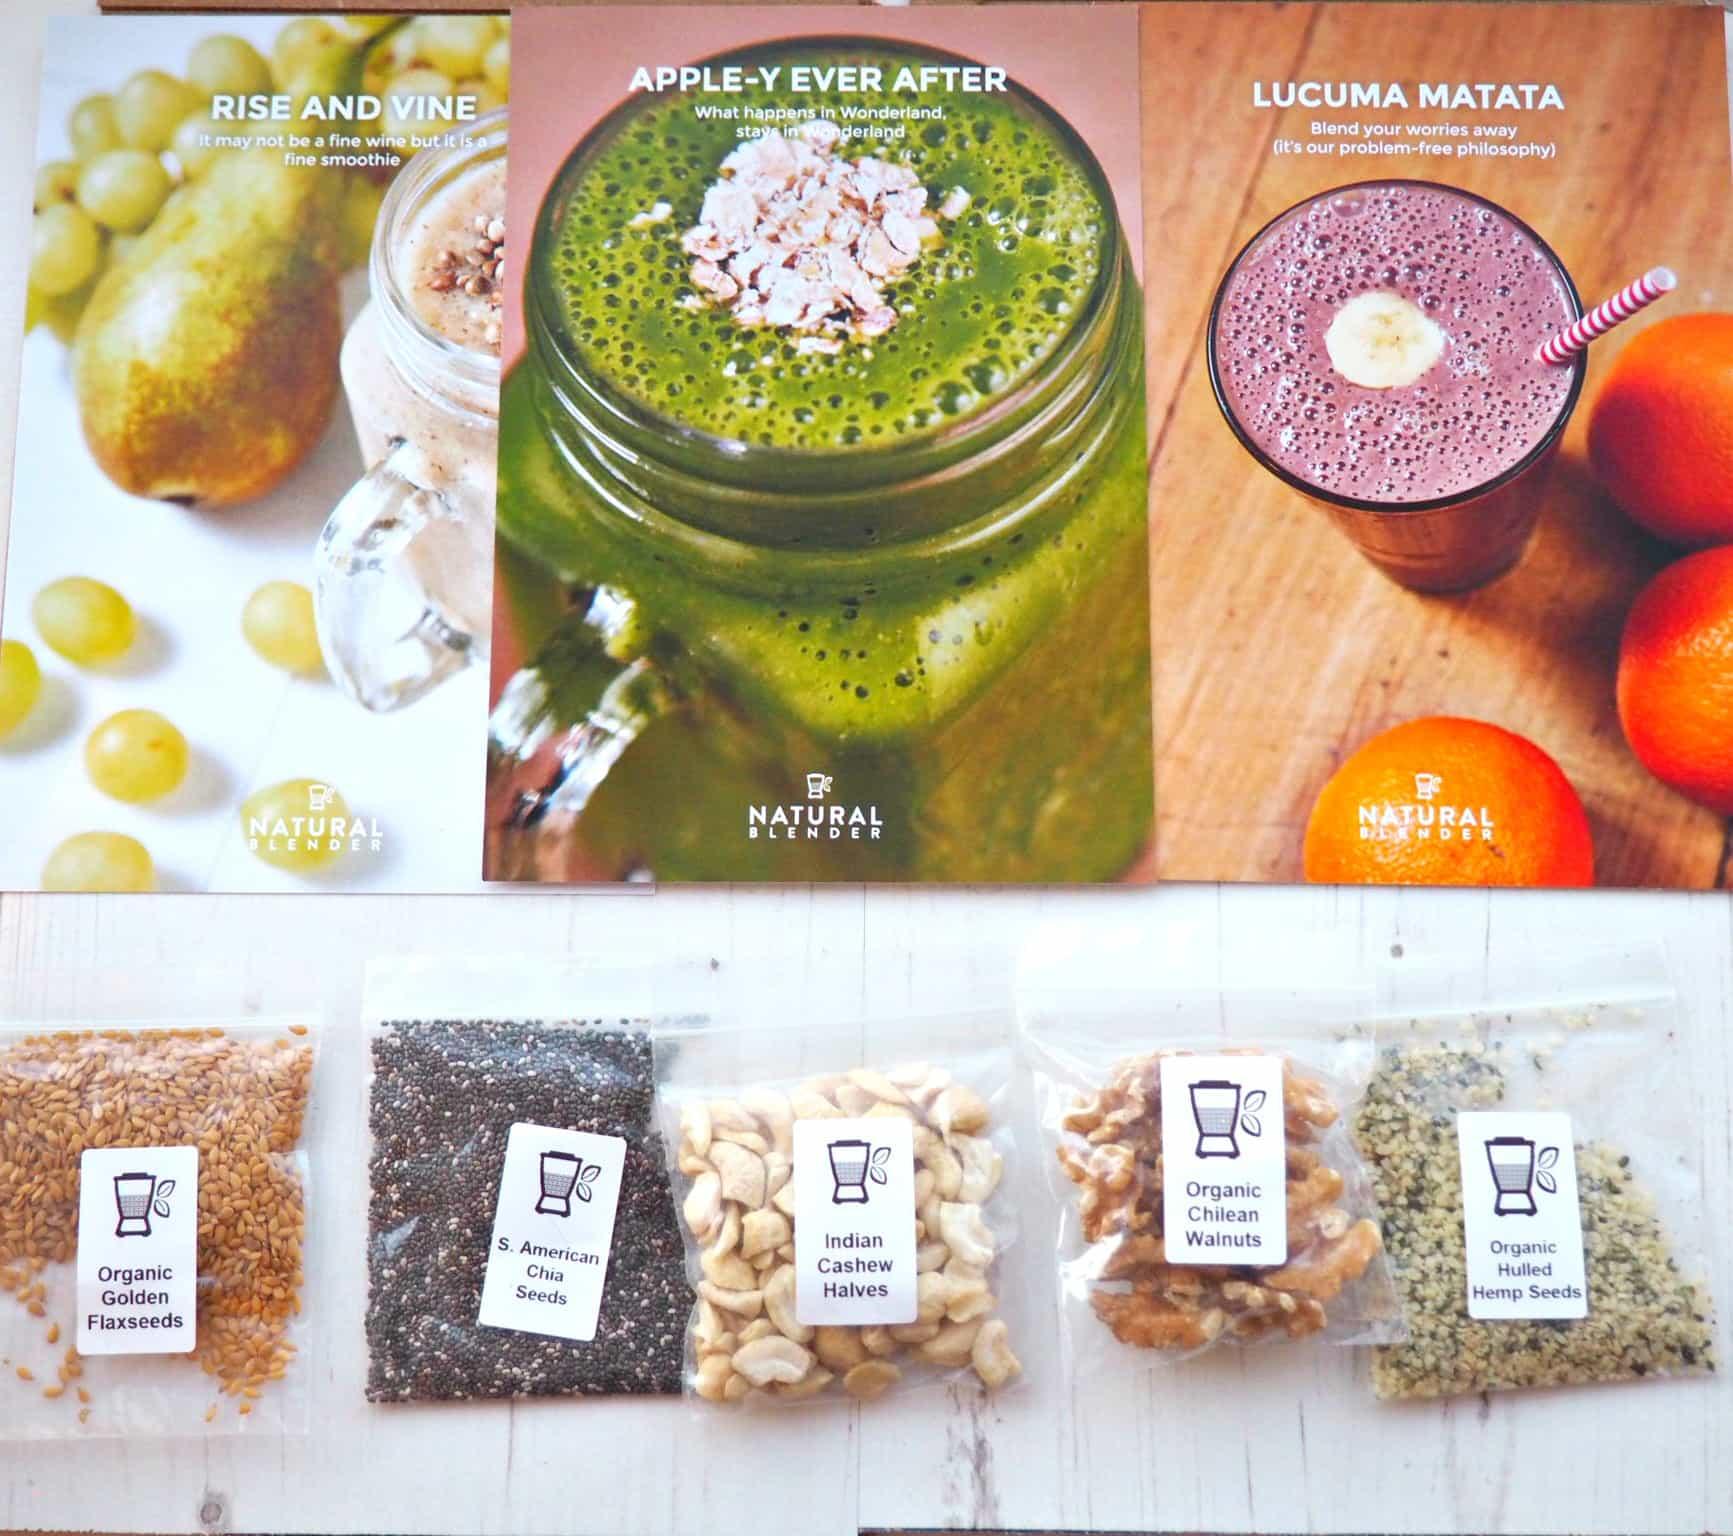 natural blender review, natural blender, smoothies ibd, natural blender discount code, crohn's disease smoothies, ibs smoothies, ibd smoothies, ibd juicing